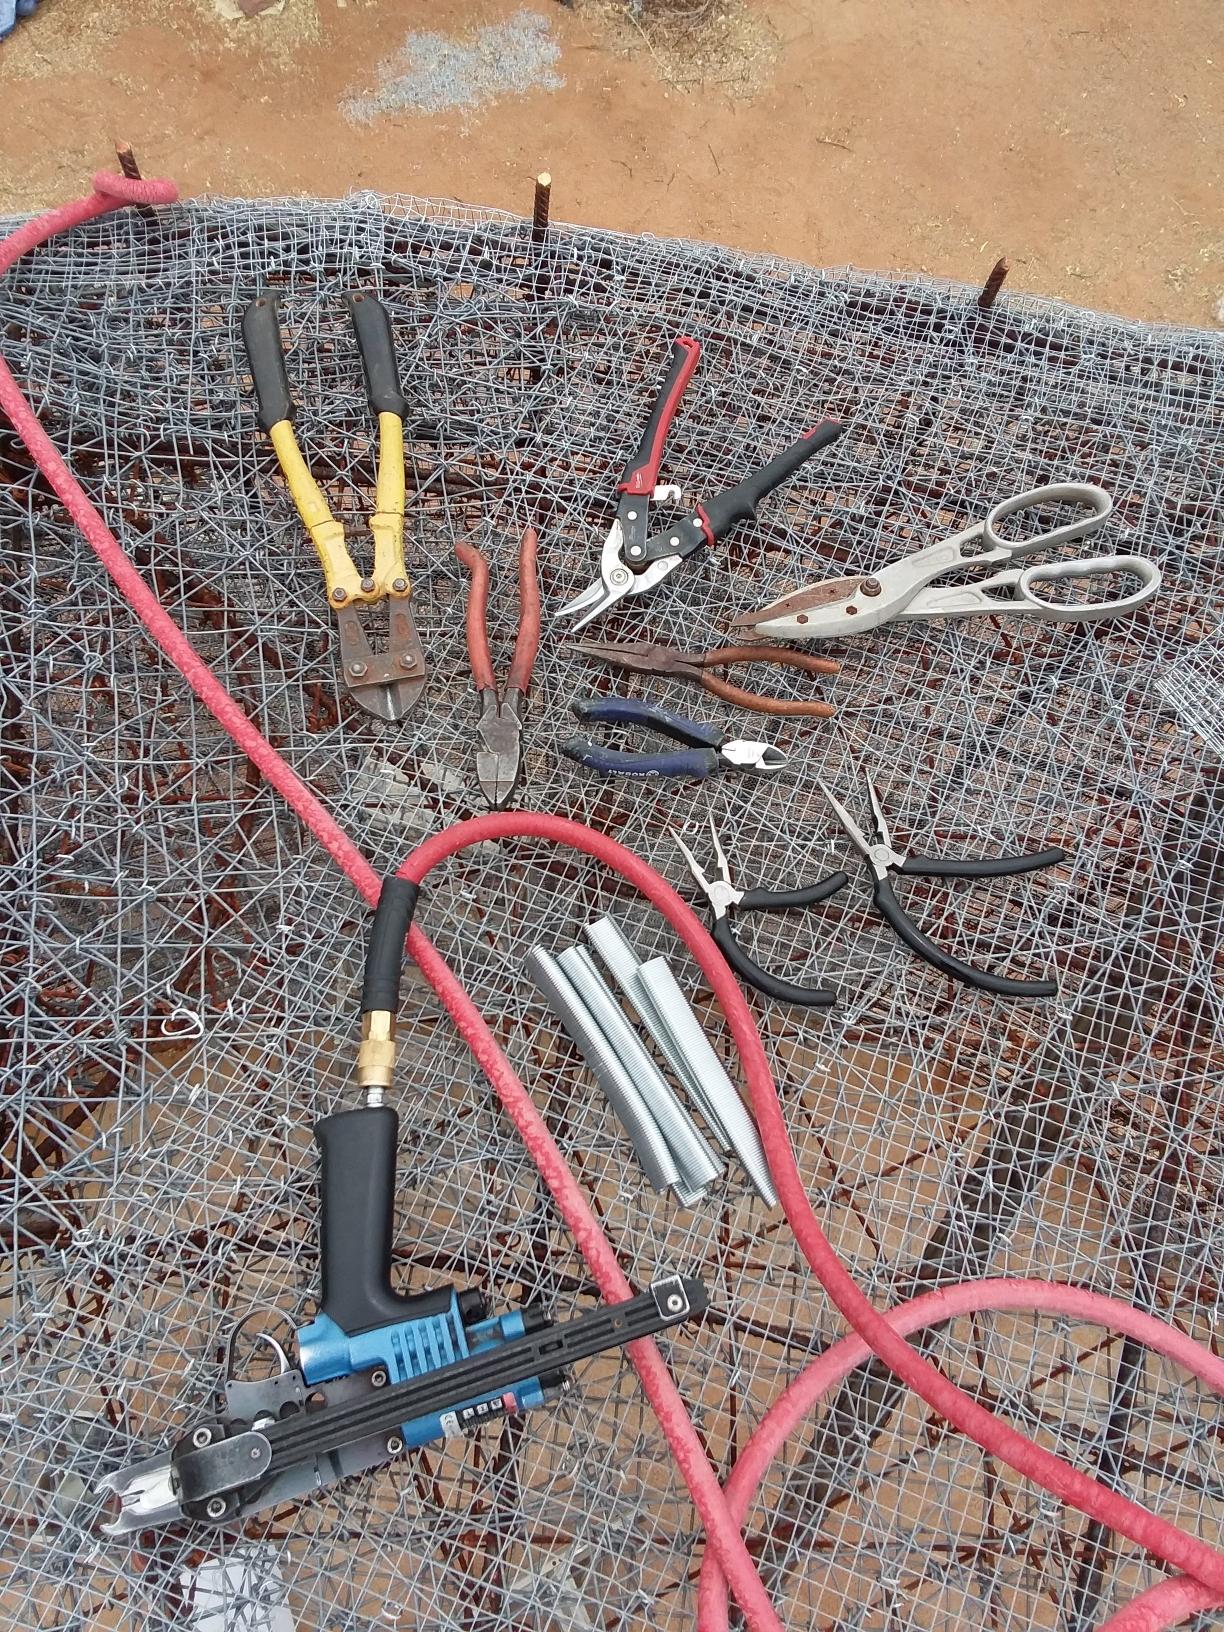 Tools on Roof